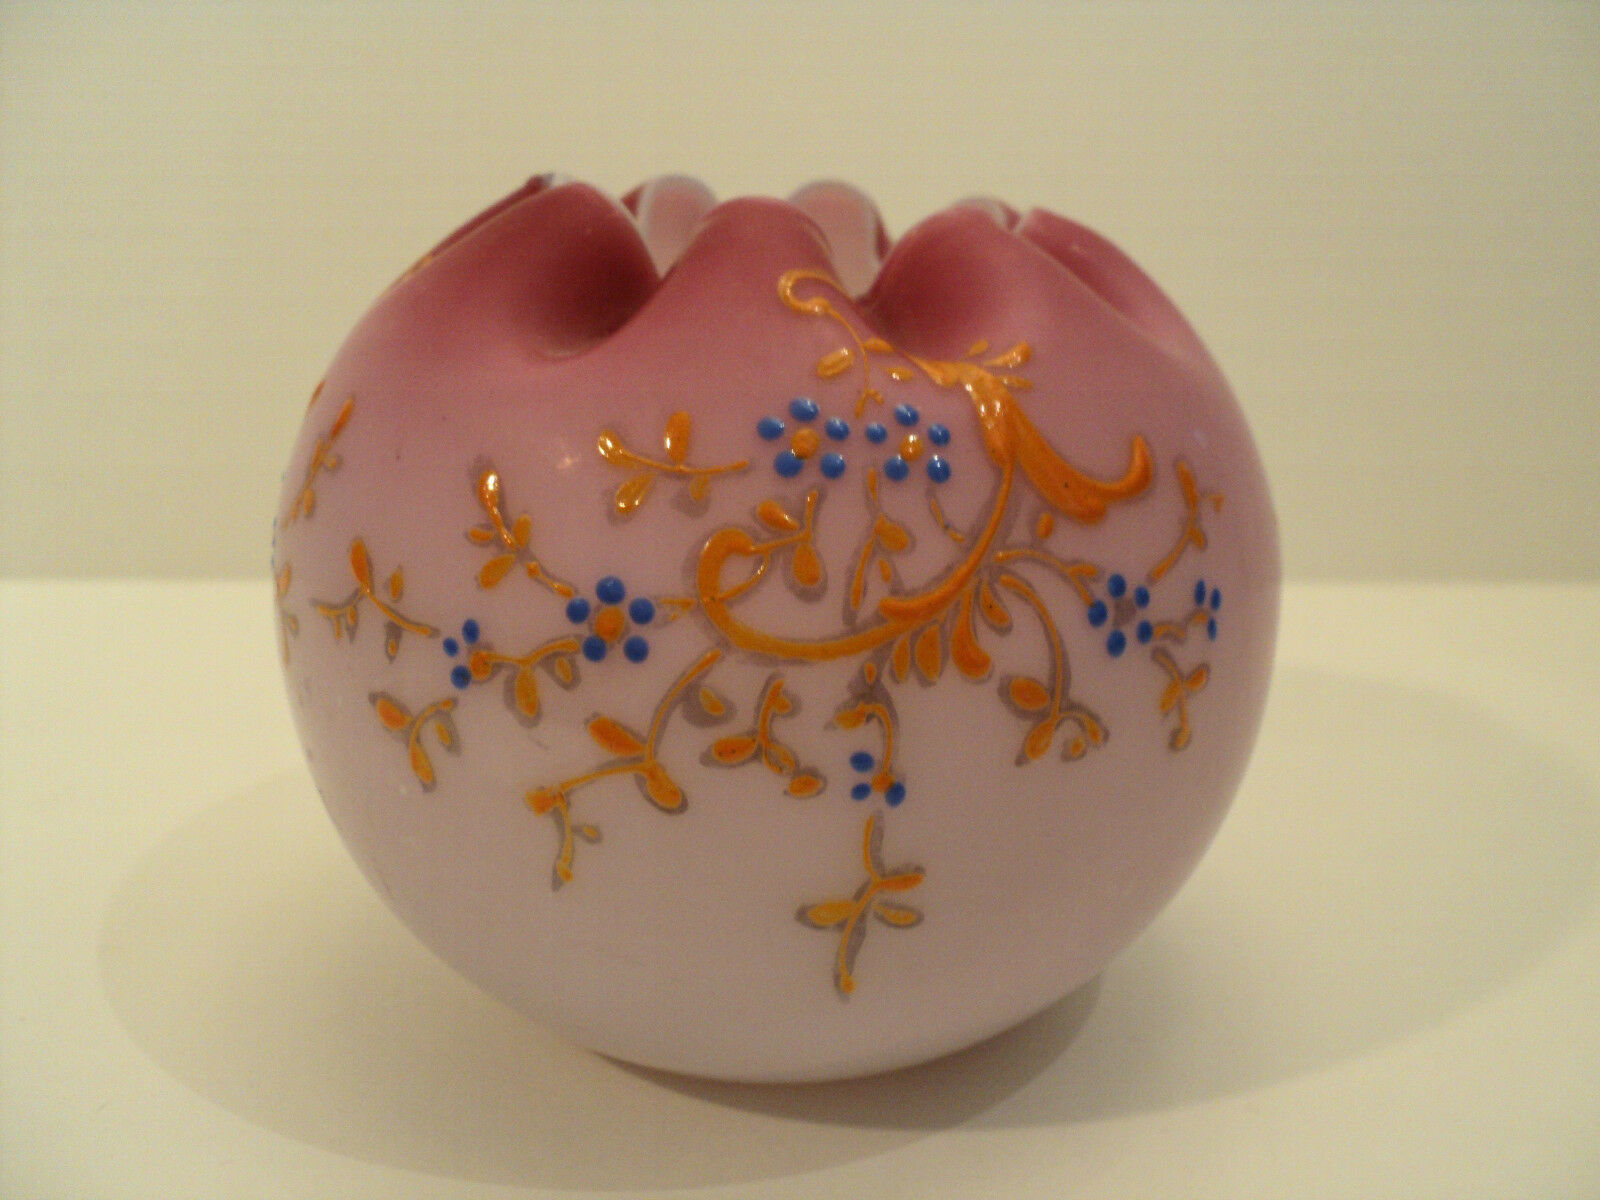 VICTORIAN ERA PINK SATIN GLASS ROSE BOWL with ENAMELED DECORATION